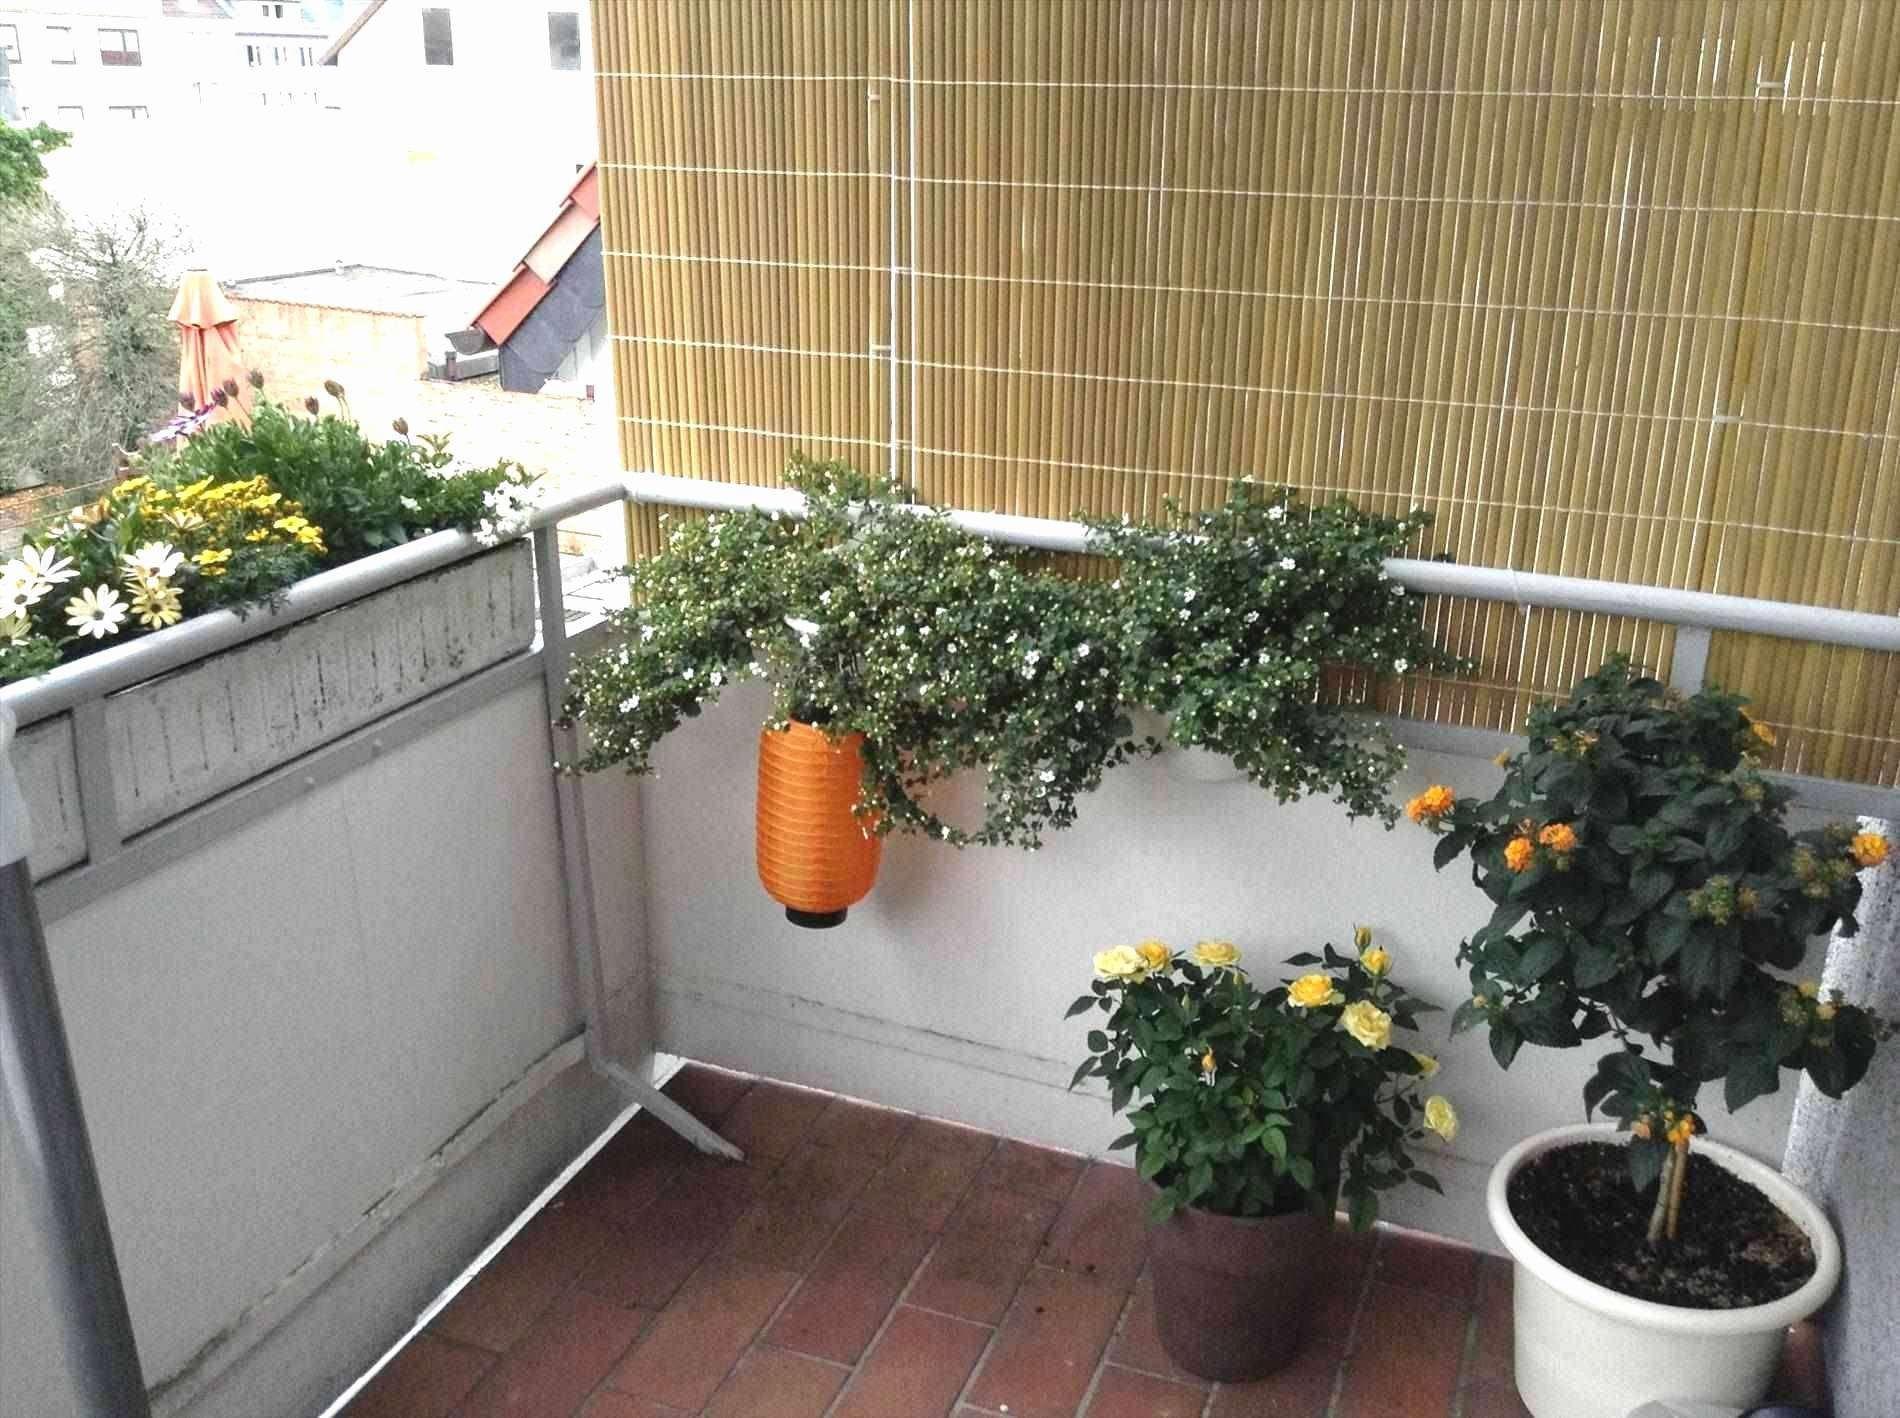 Konzept 44 Fur Angerer Balkon Sichtschutz Check More At Https